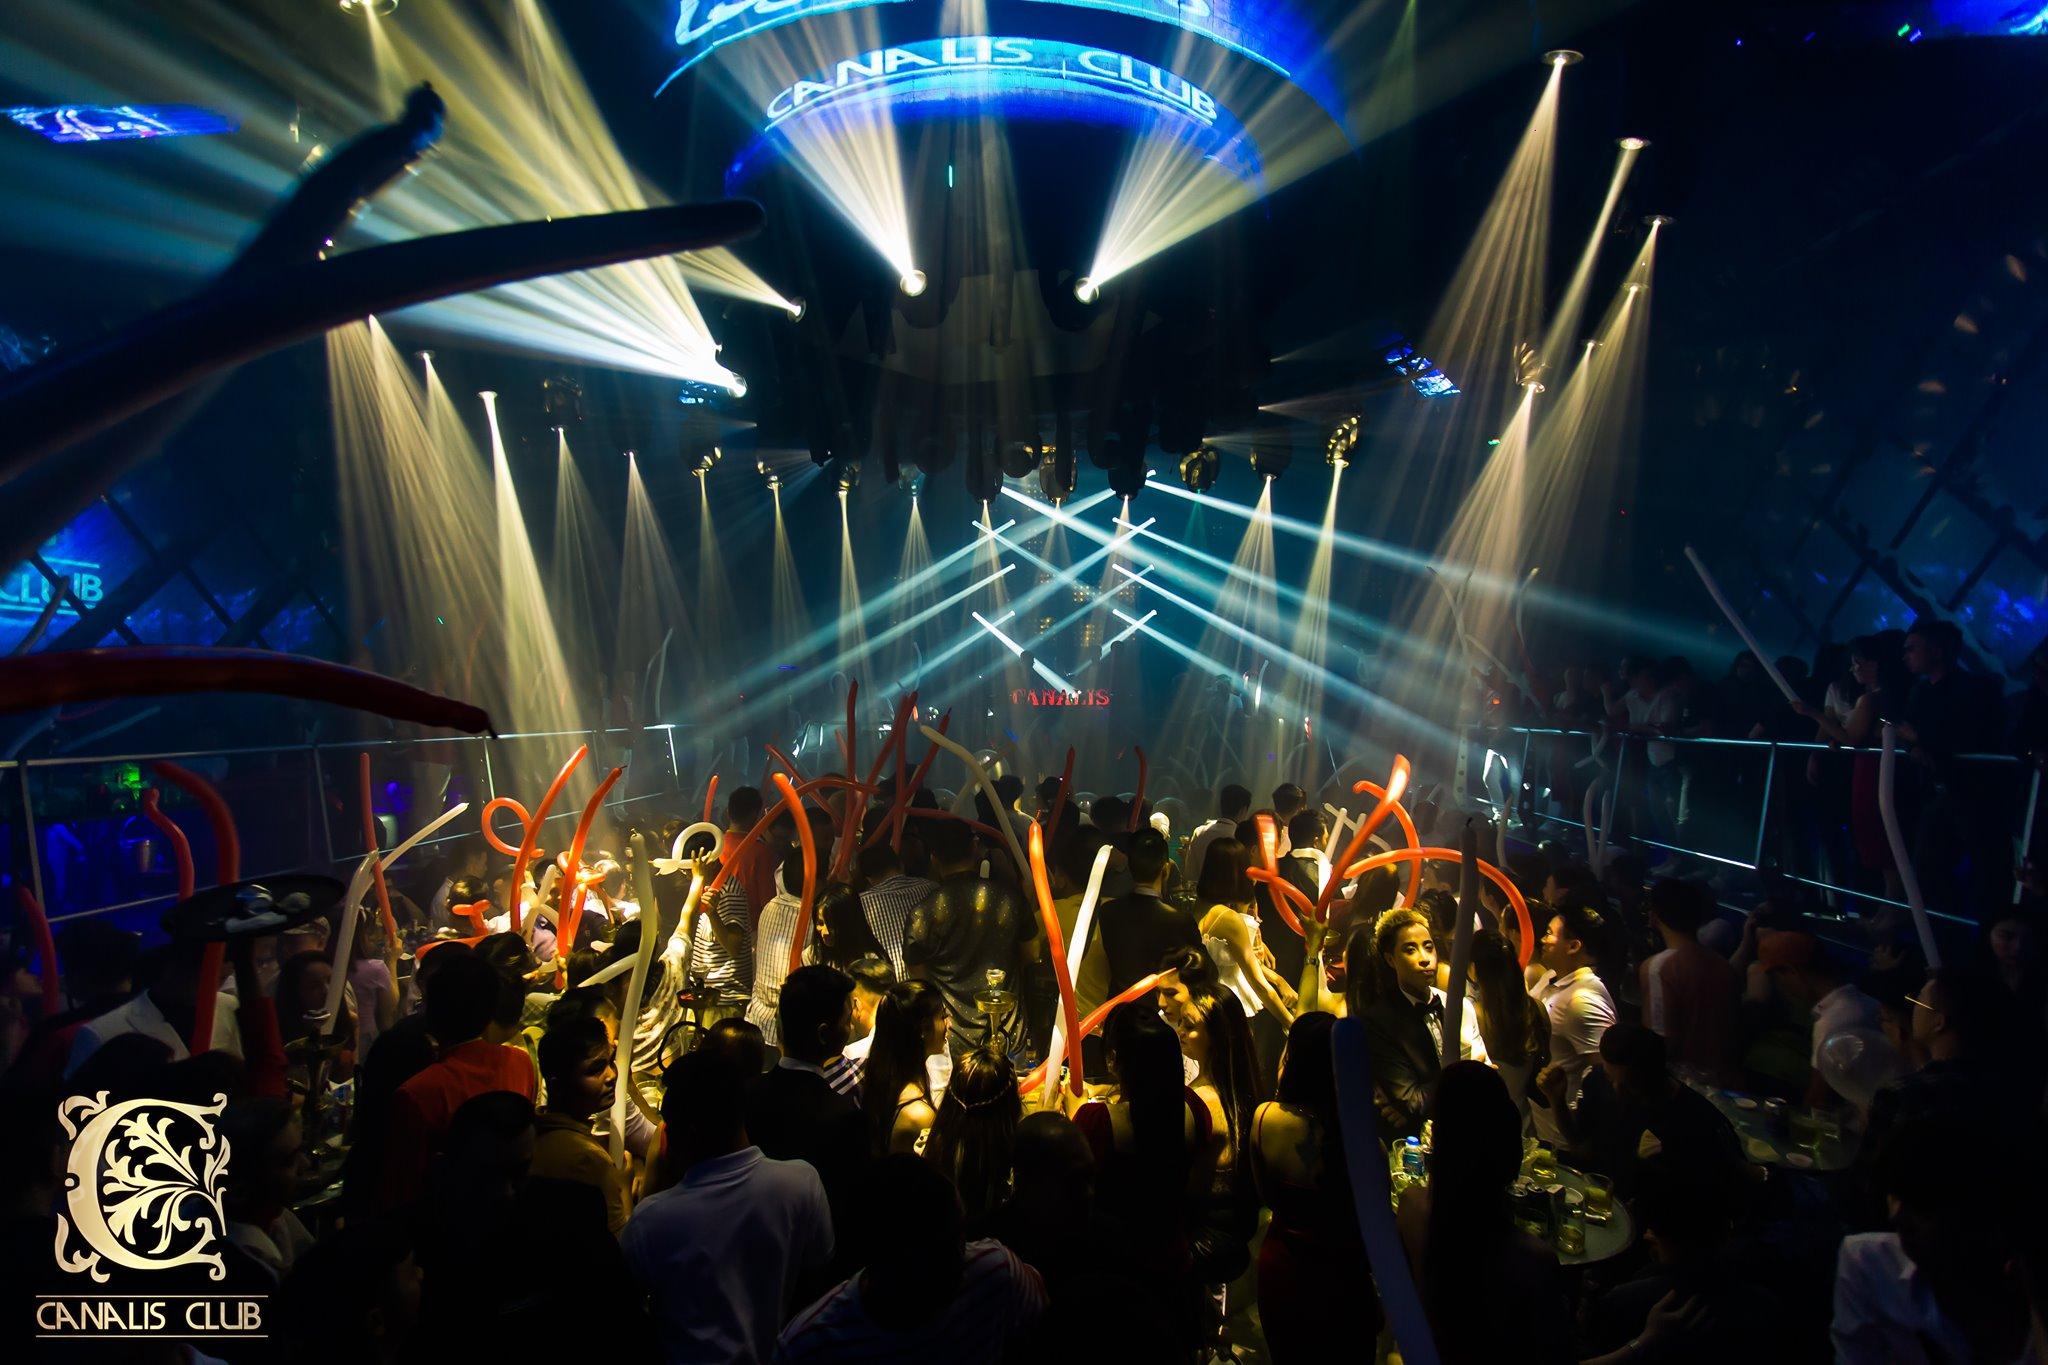 Canalis Club Nightlife in Ho Chi Minh City